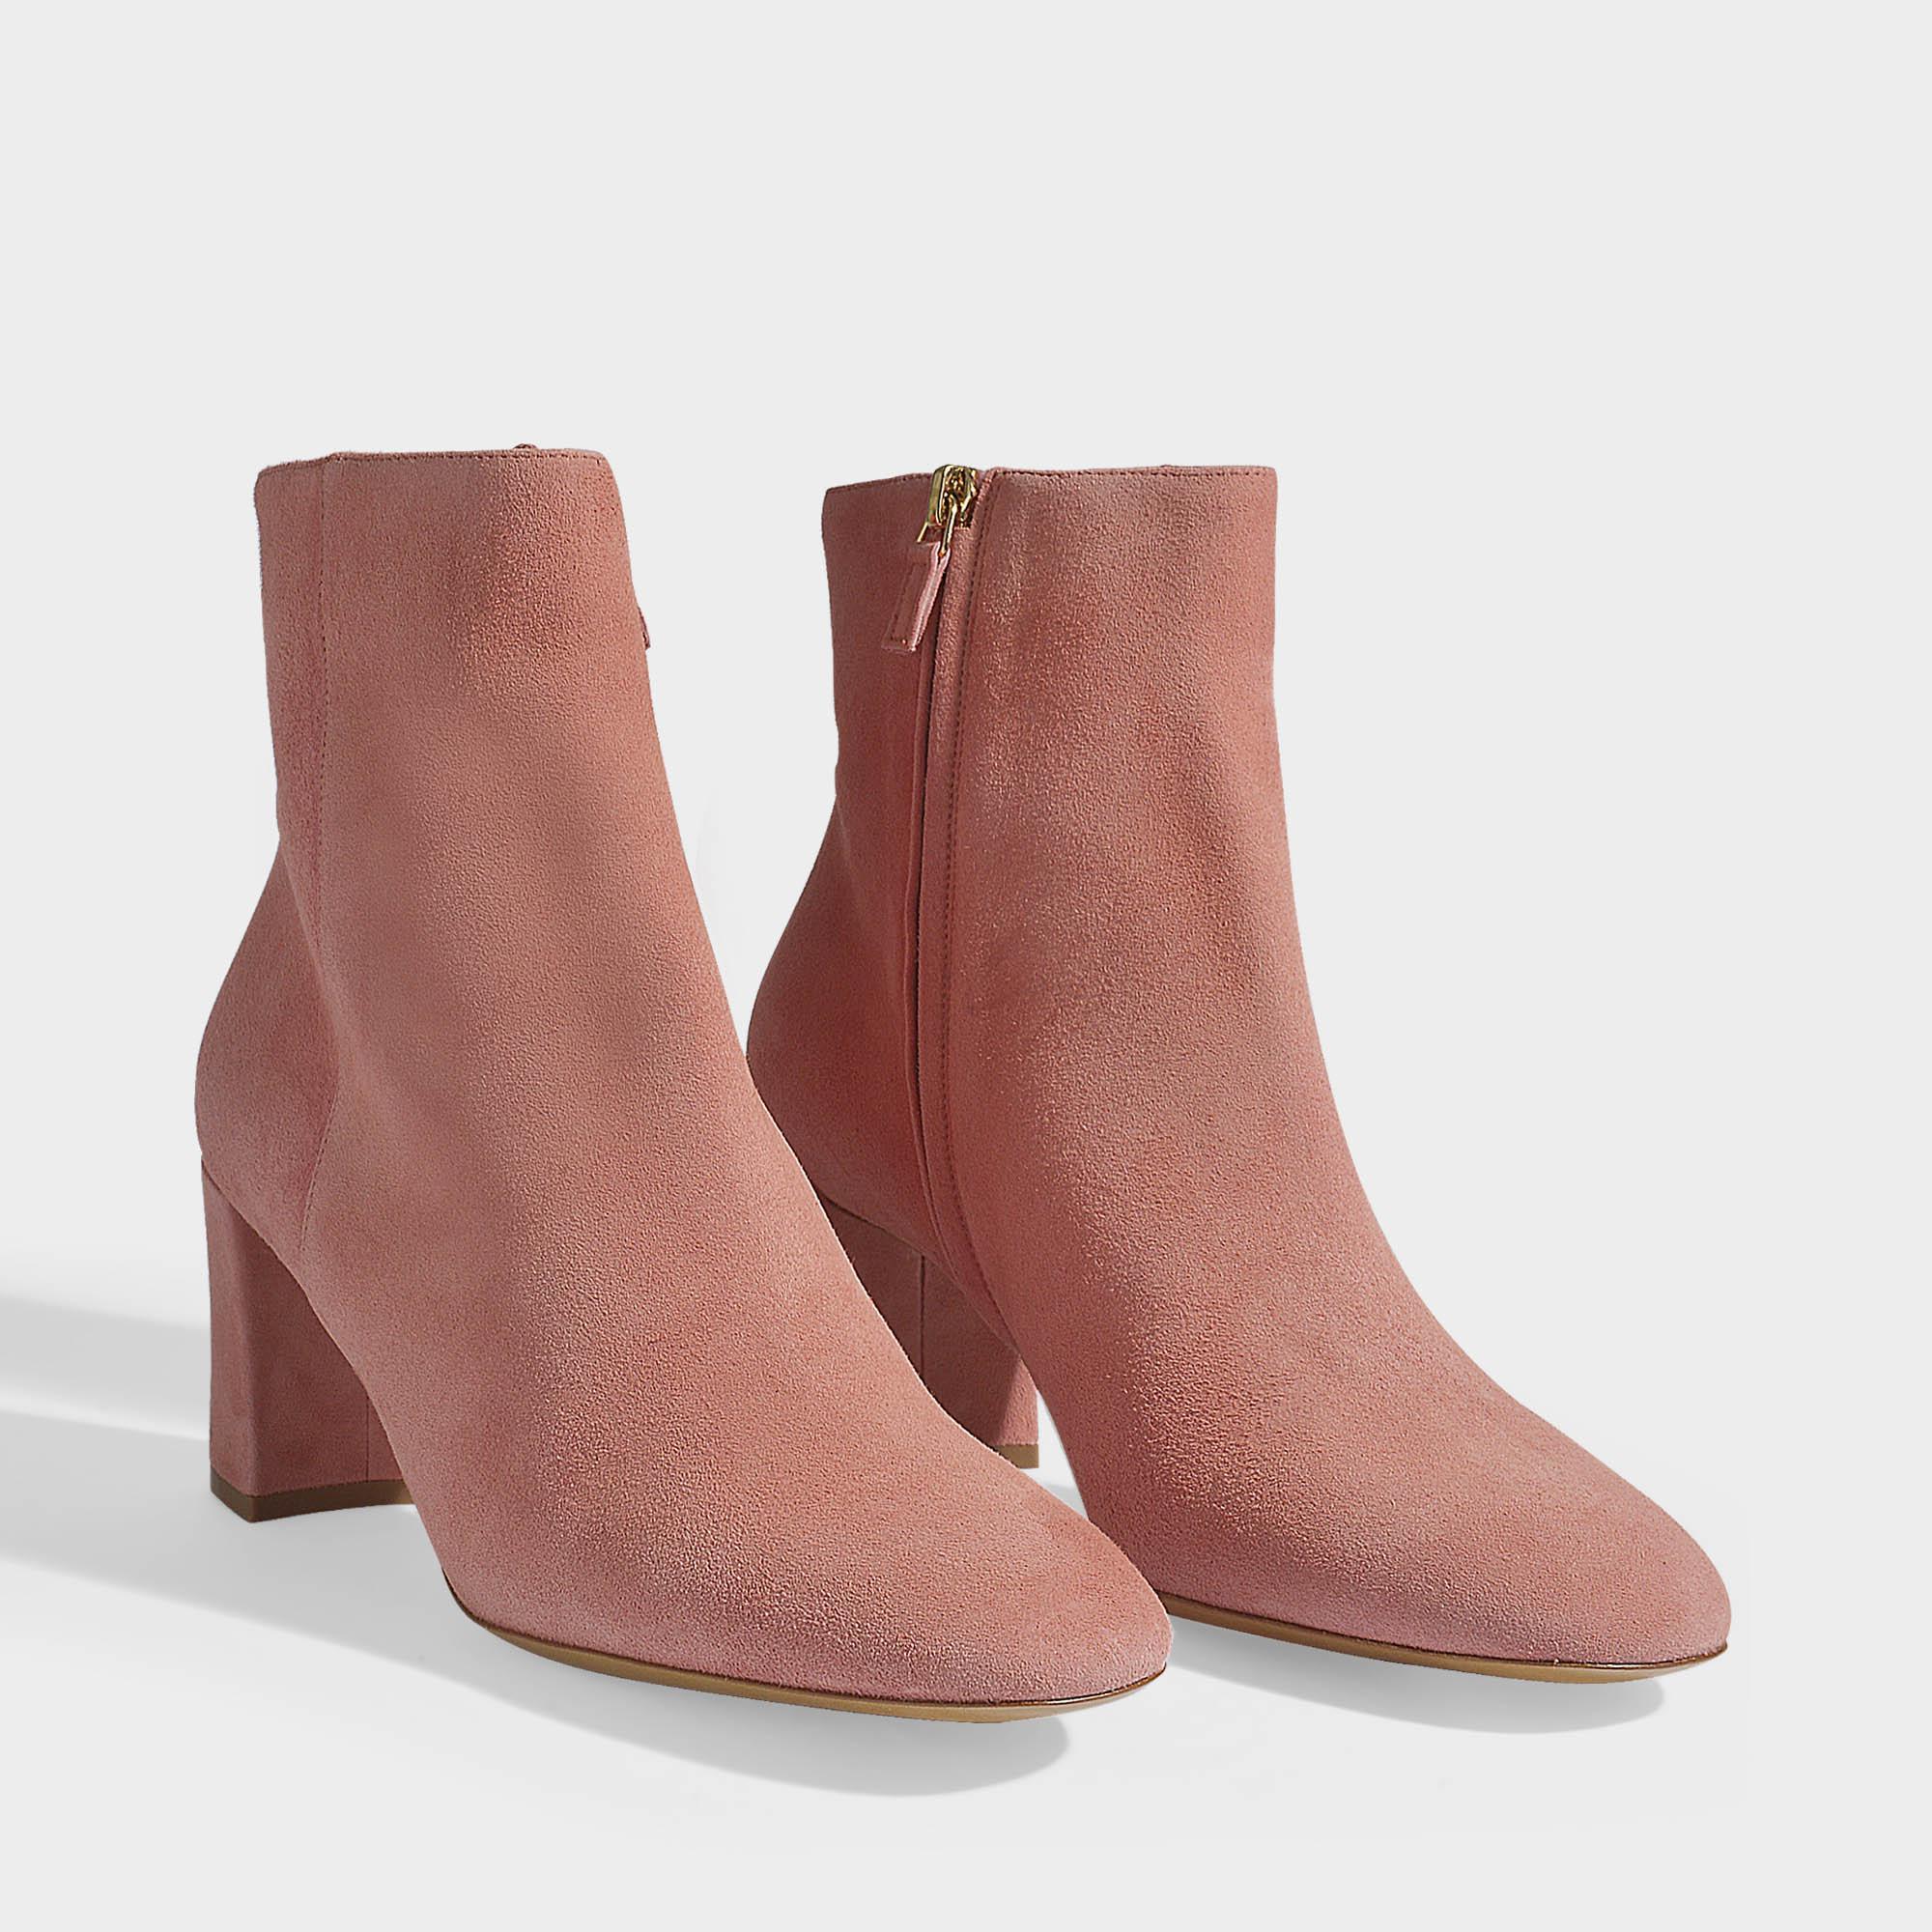 Mansur Gavriel Ankle Boots In Blush